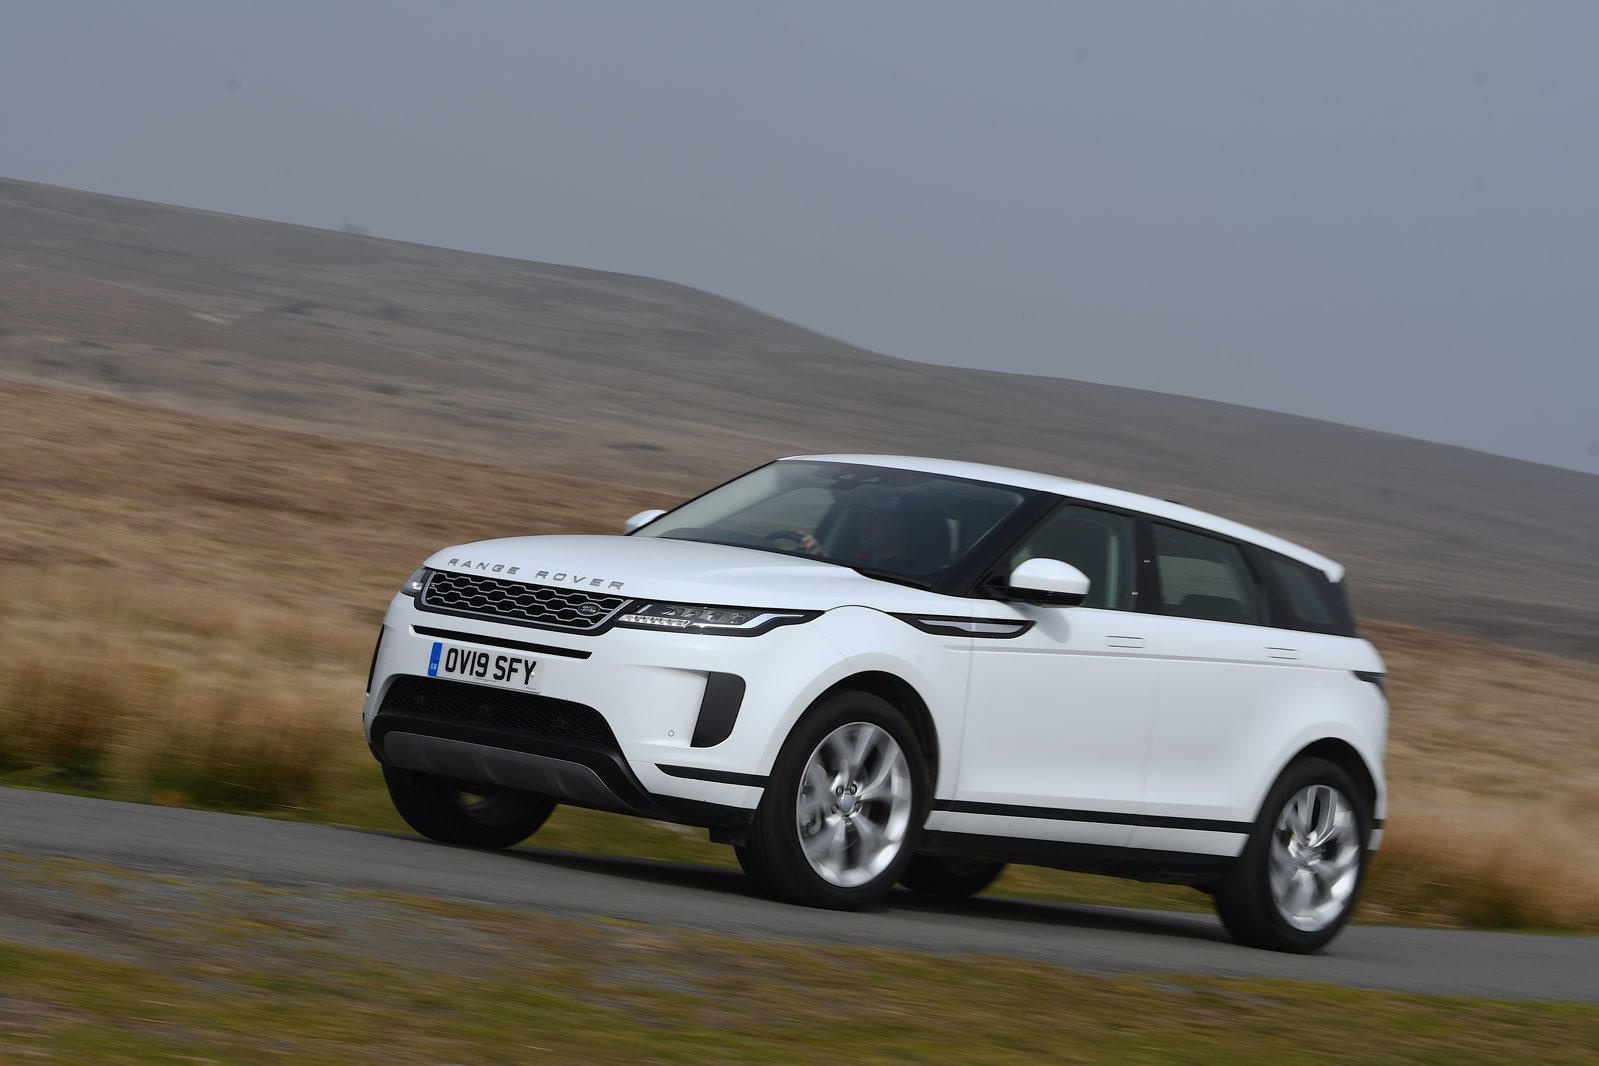 2019 Land Rover Range Rover Evoque front left tracking wide RHD